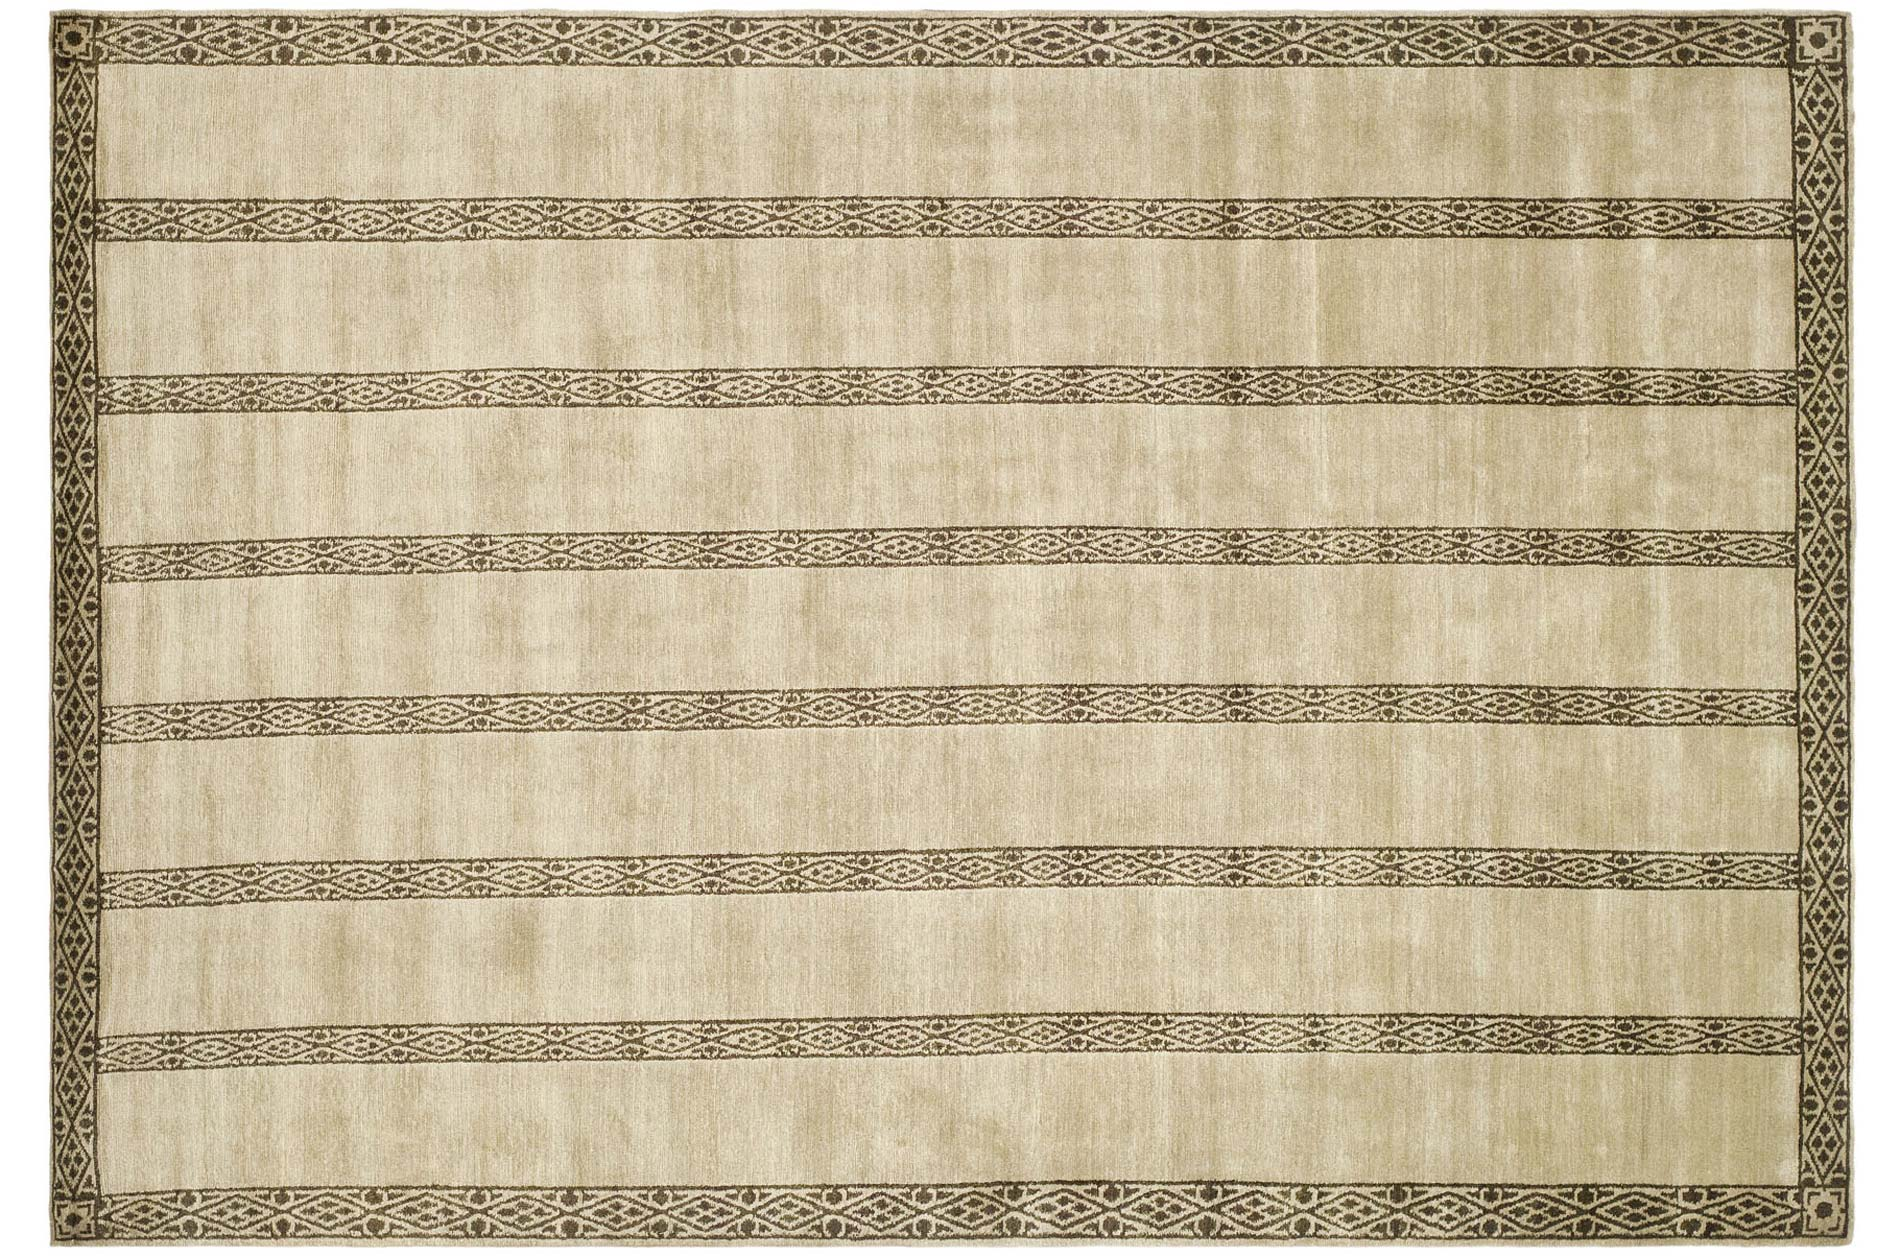 Handmade Thomas O'Brien Marco Olive/ Green Wool Rug (6' x 9')